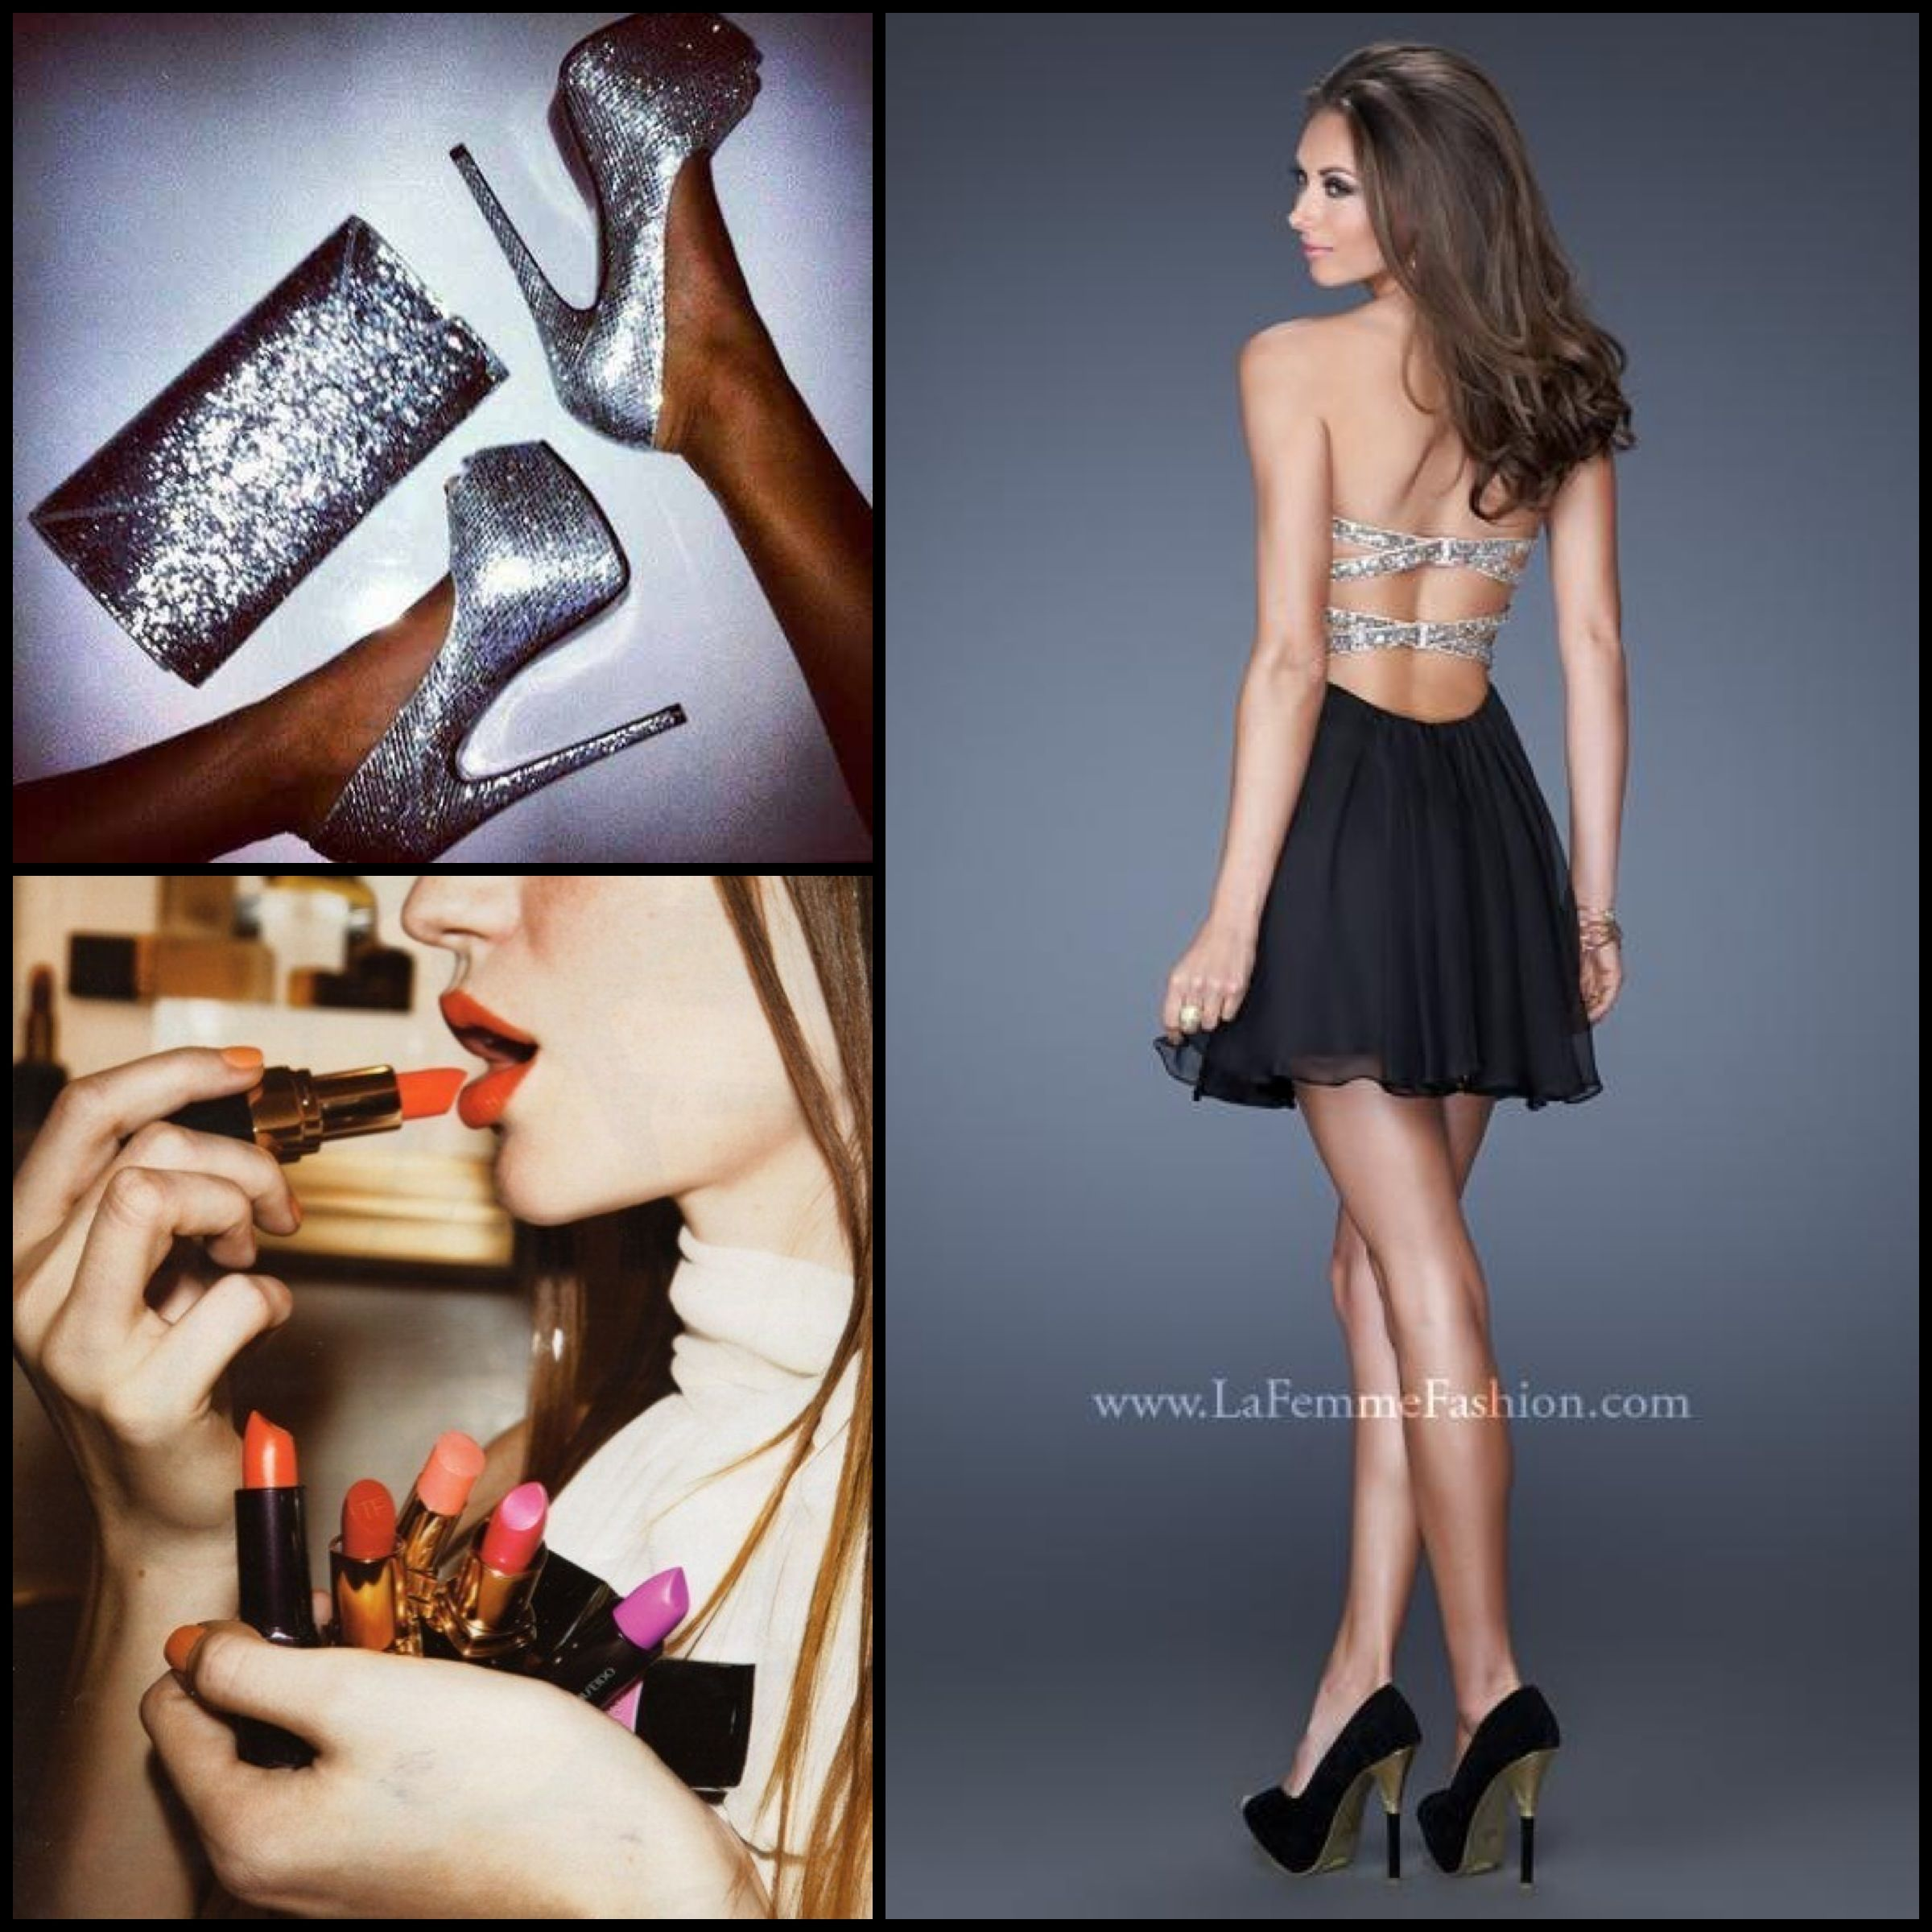 Black dress lipstick - La Femme Style 19441 Black Little Black Dress Homecoming Dress Prom Dress